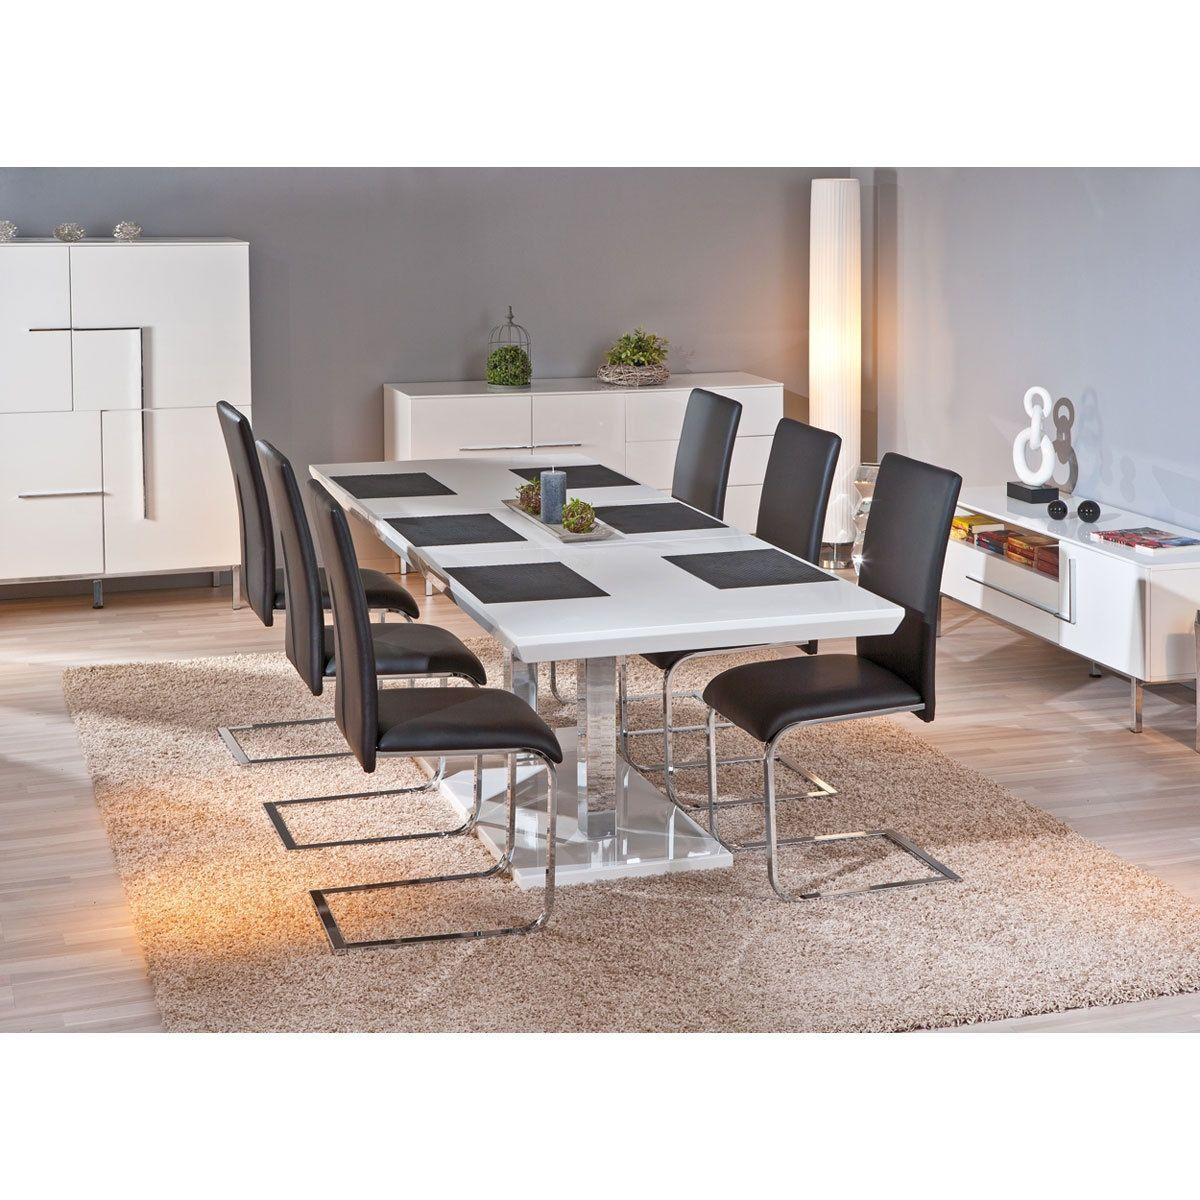 Table Extensible Laque Blanc Et Pieds Metal Chrome Edna In 2020